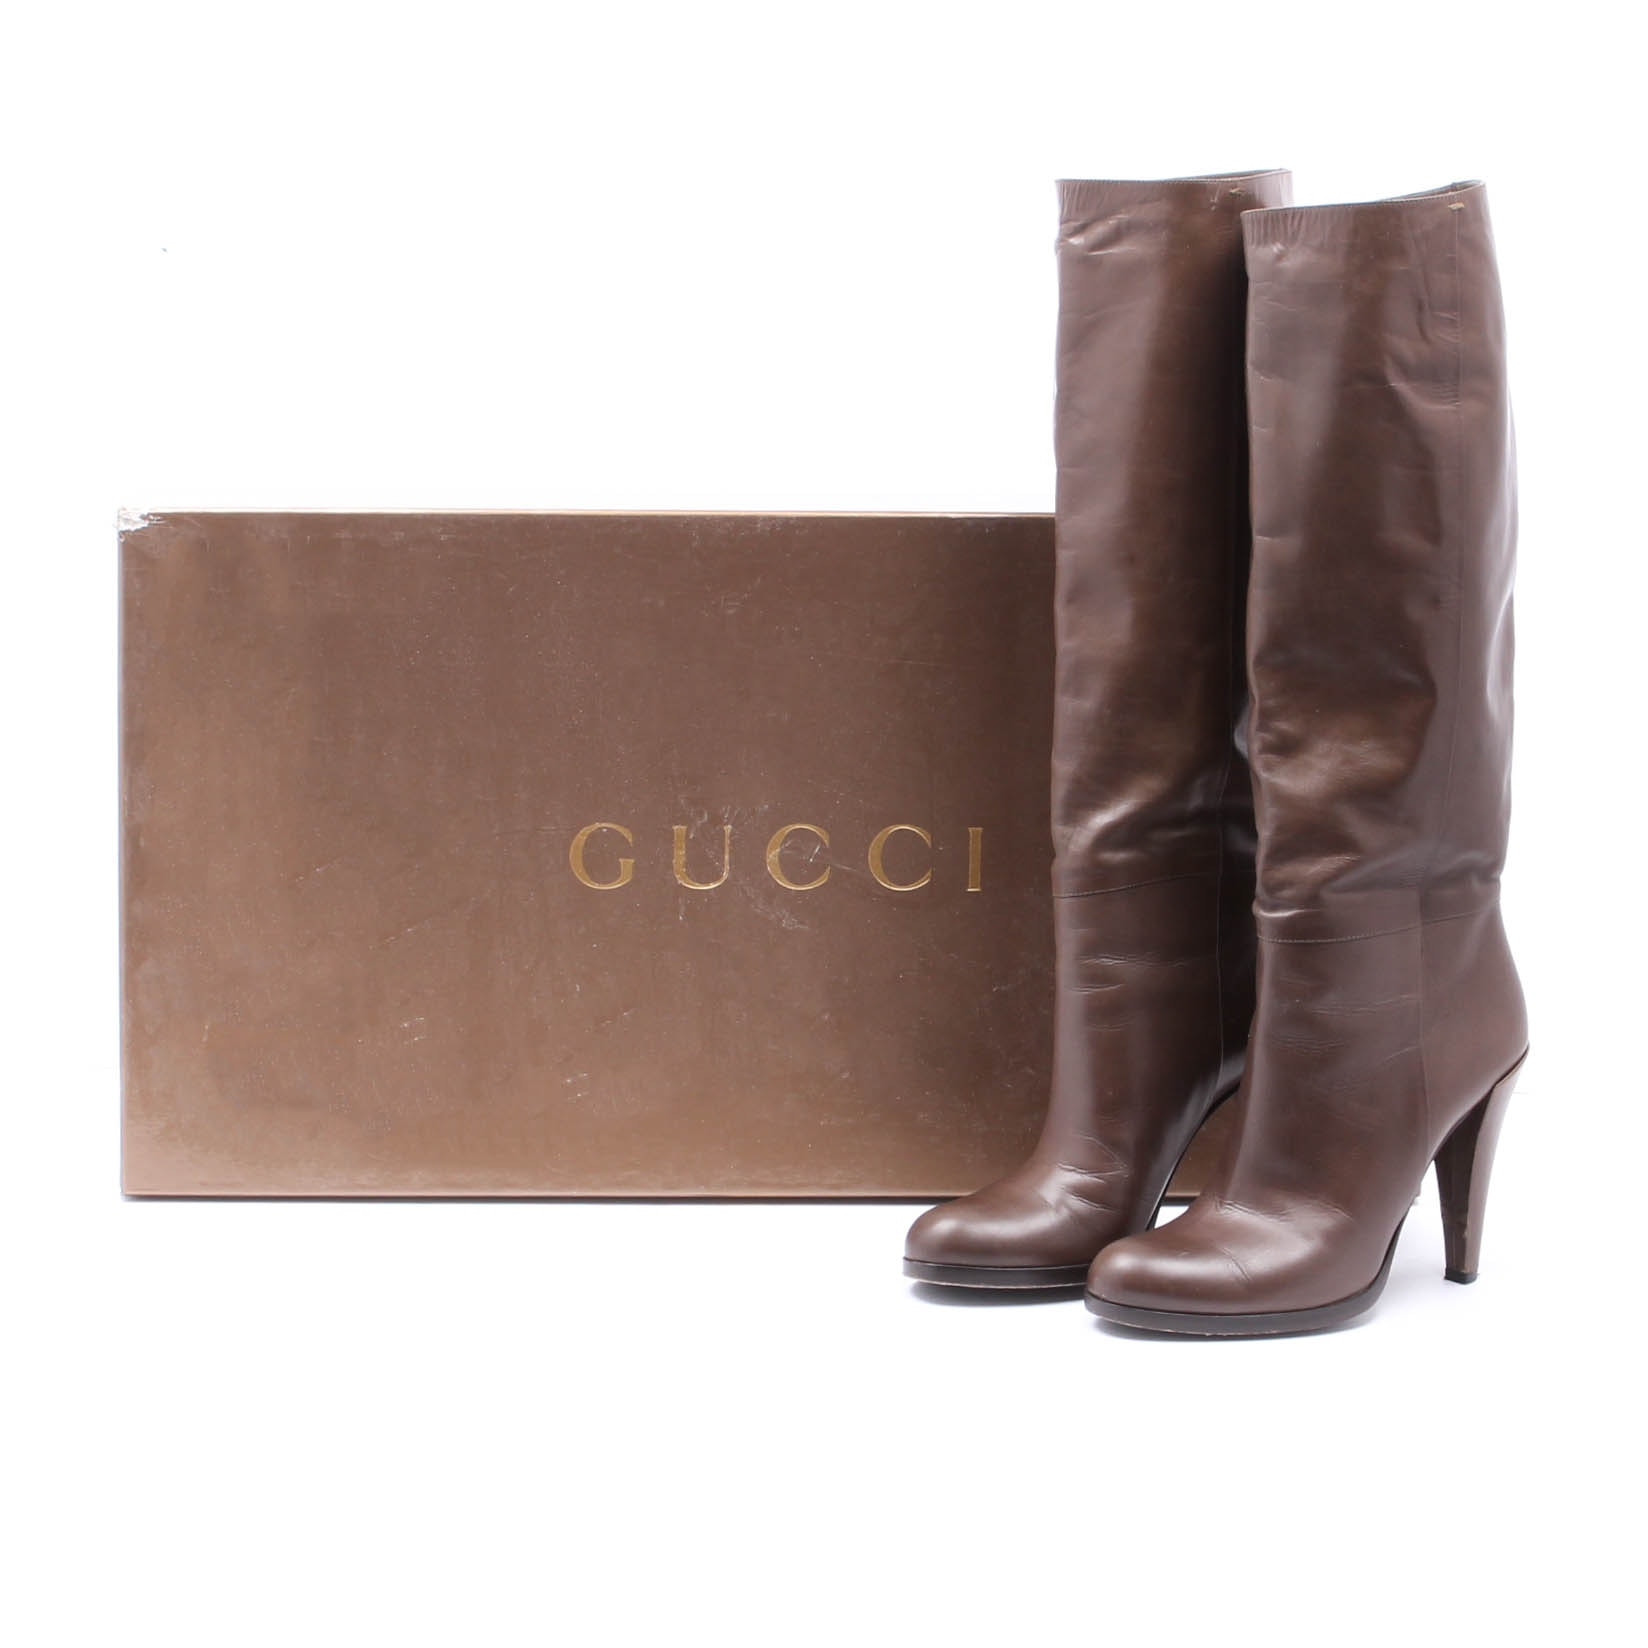 Gucci Elizabeth Dapple Brown Leather Boots